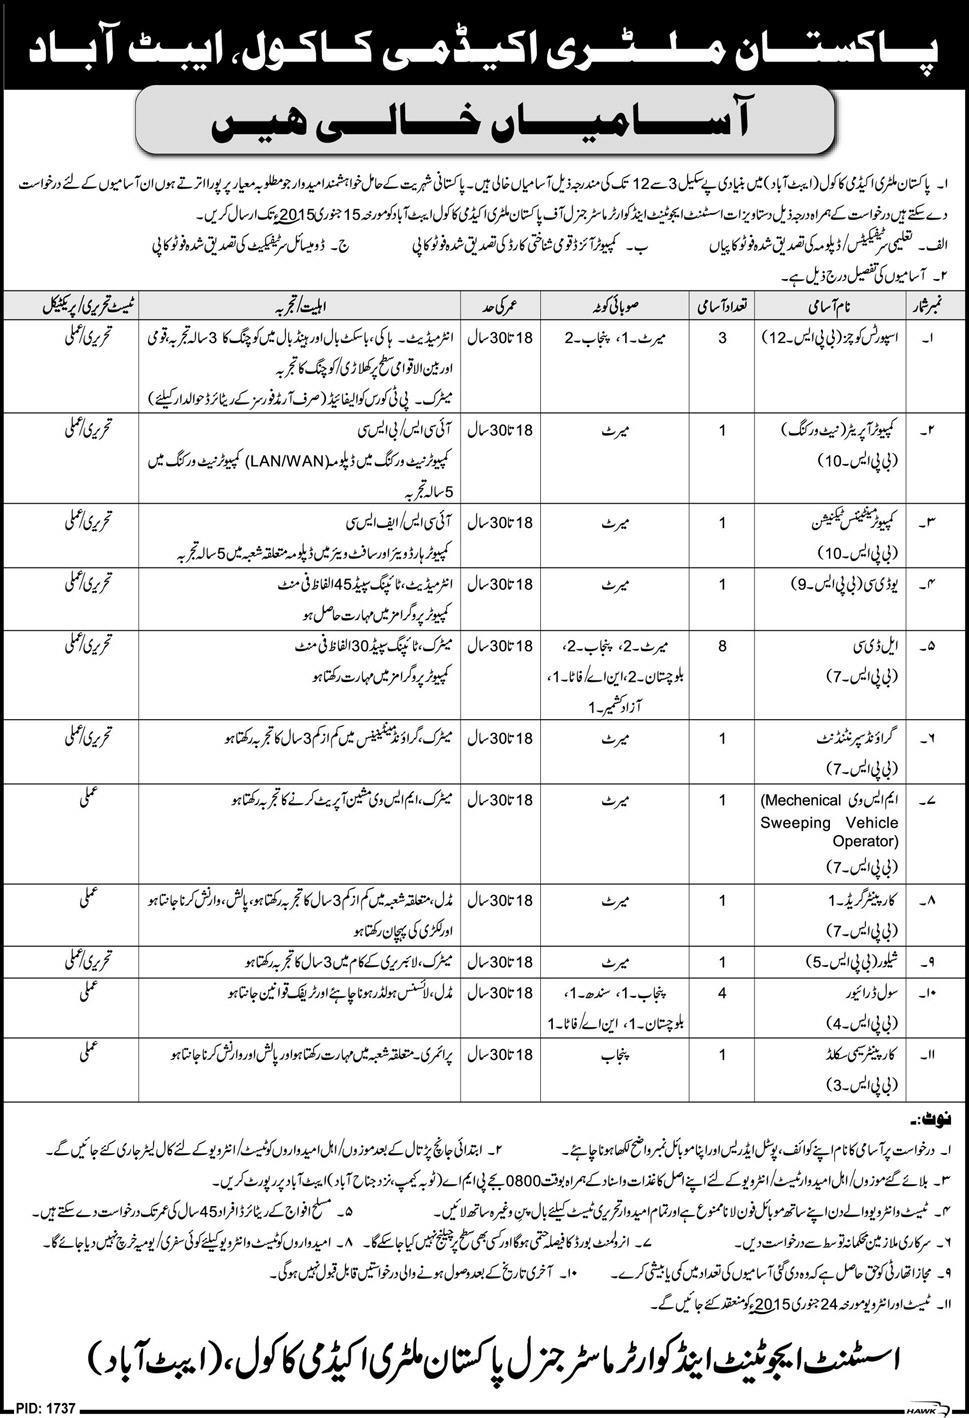 Pakistan Military Academy Kakul Abbottabad Jobs 2015 Form, Test, Interview DatesPakistan Military Academy Kakul Abbottabad Jobs 2015 Form, Test, Interview Dates